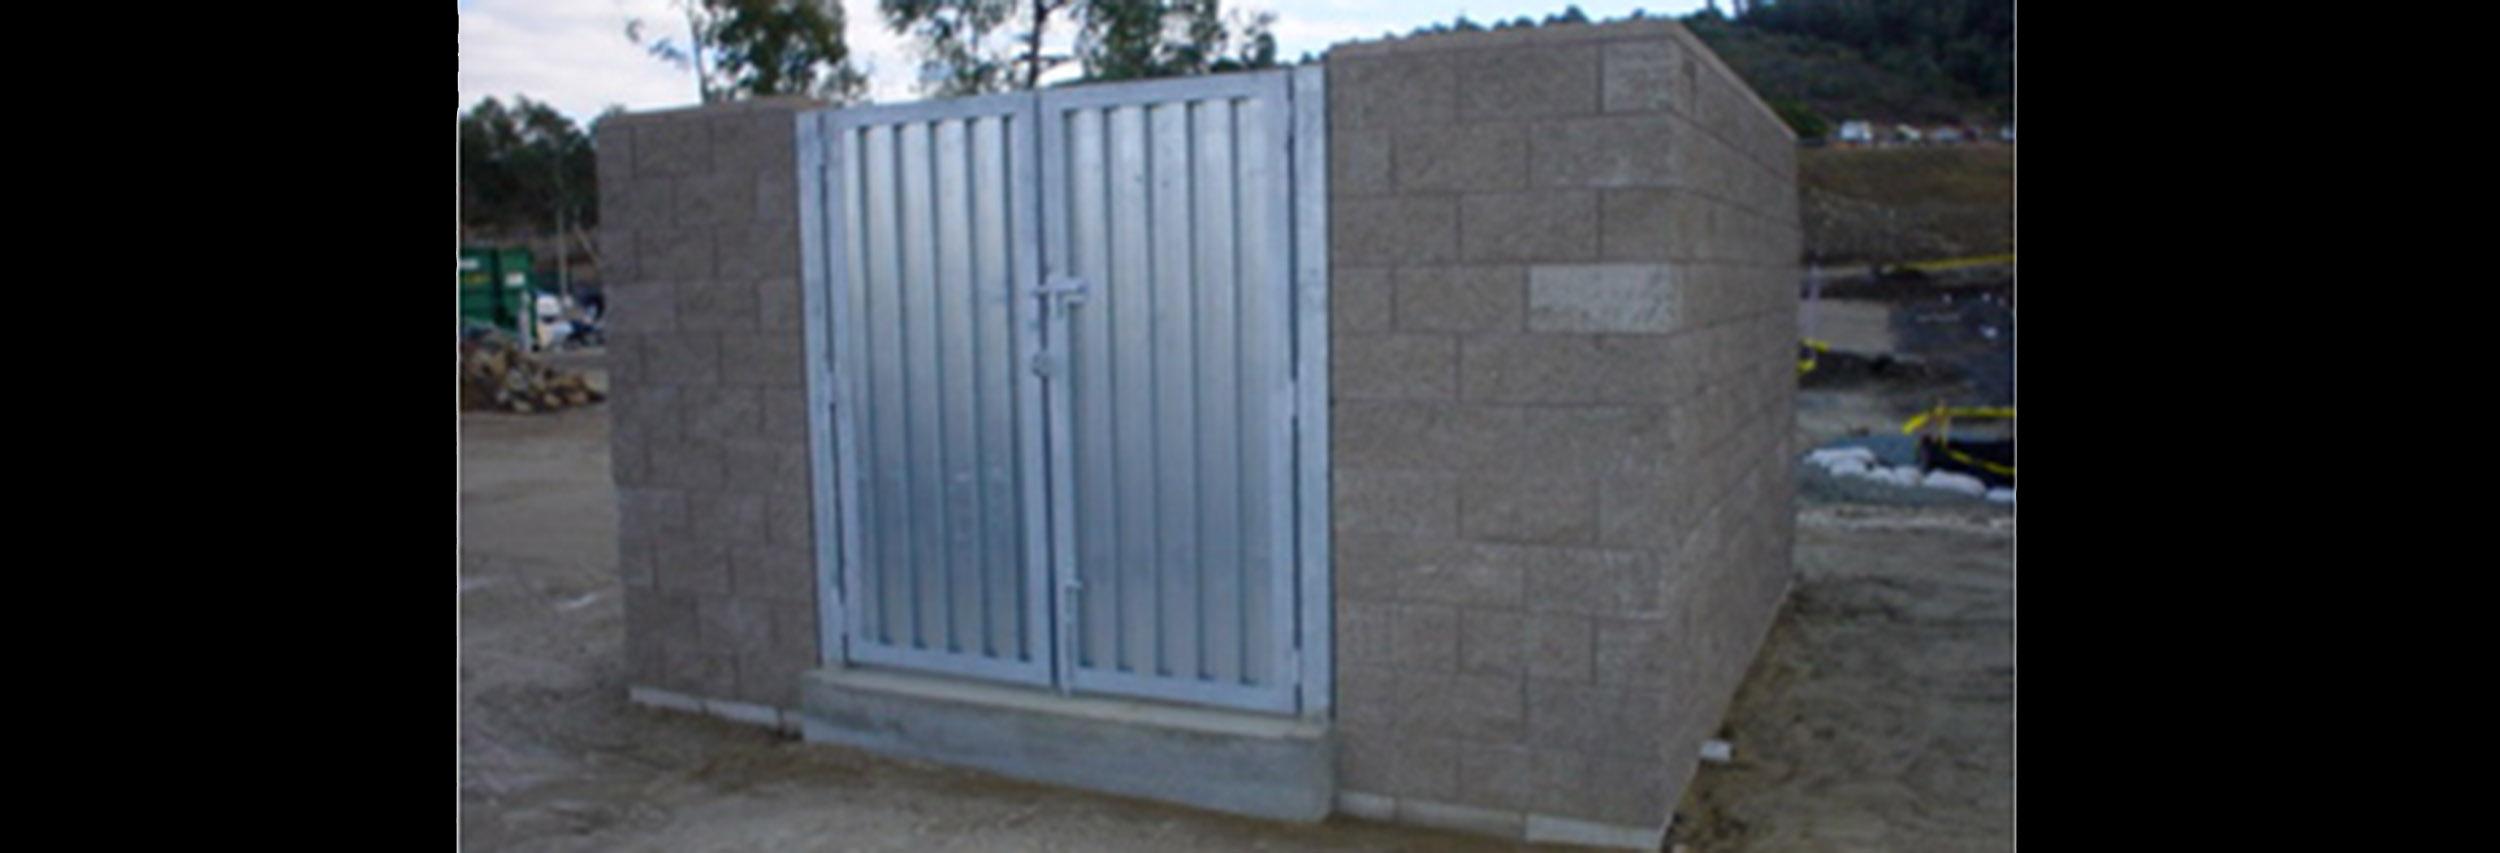 CSUSM Garage Mesh Trash Enclosure